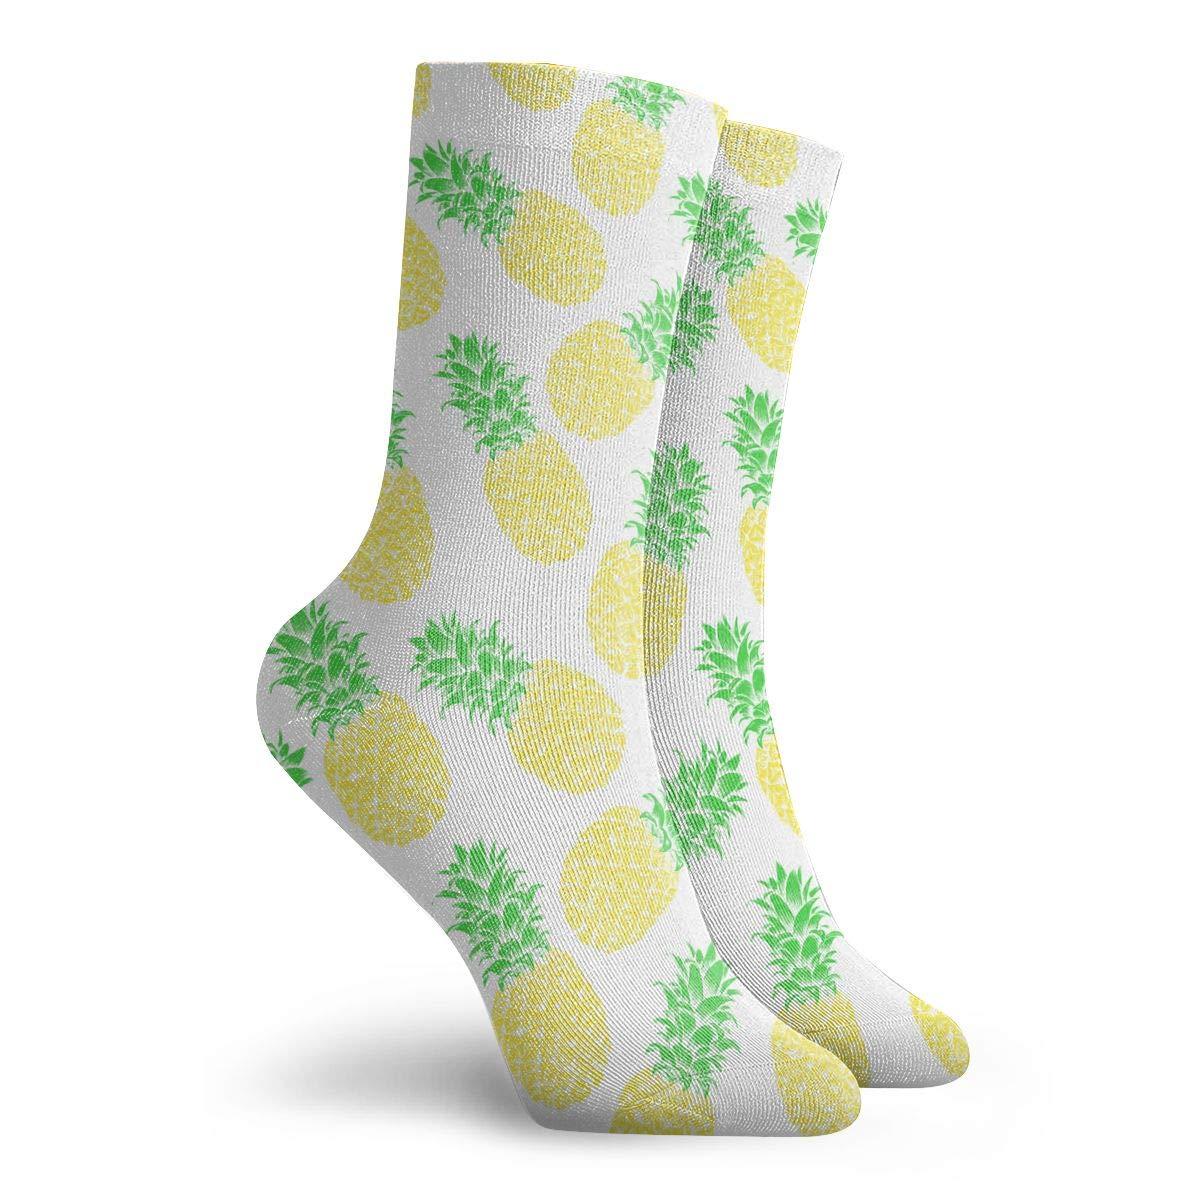 Unisex Pineapple Pattern Athletic Quarter Ankle Print Breathable Hiking Running Socks